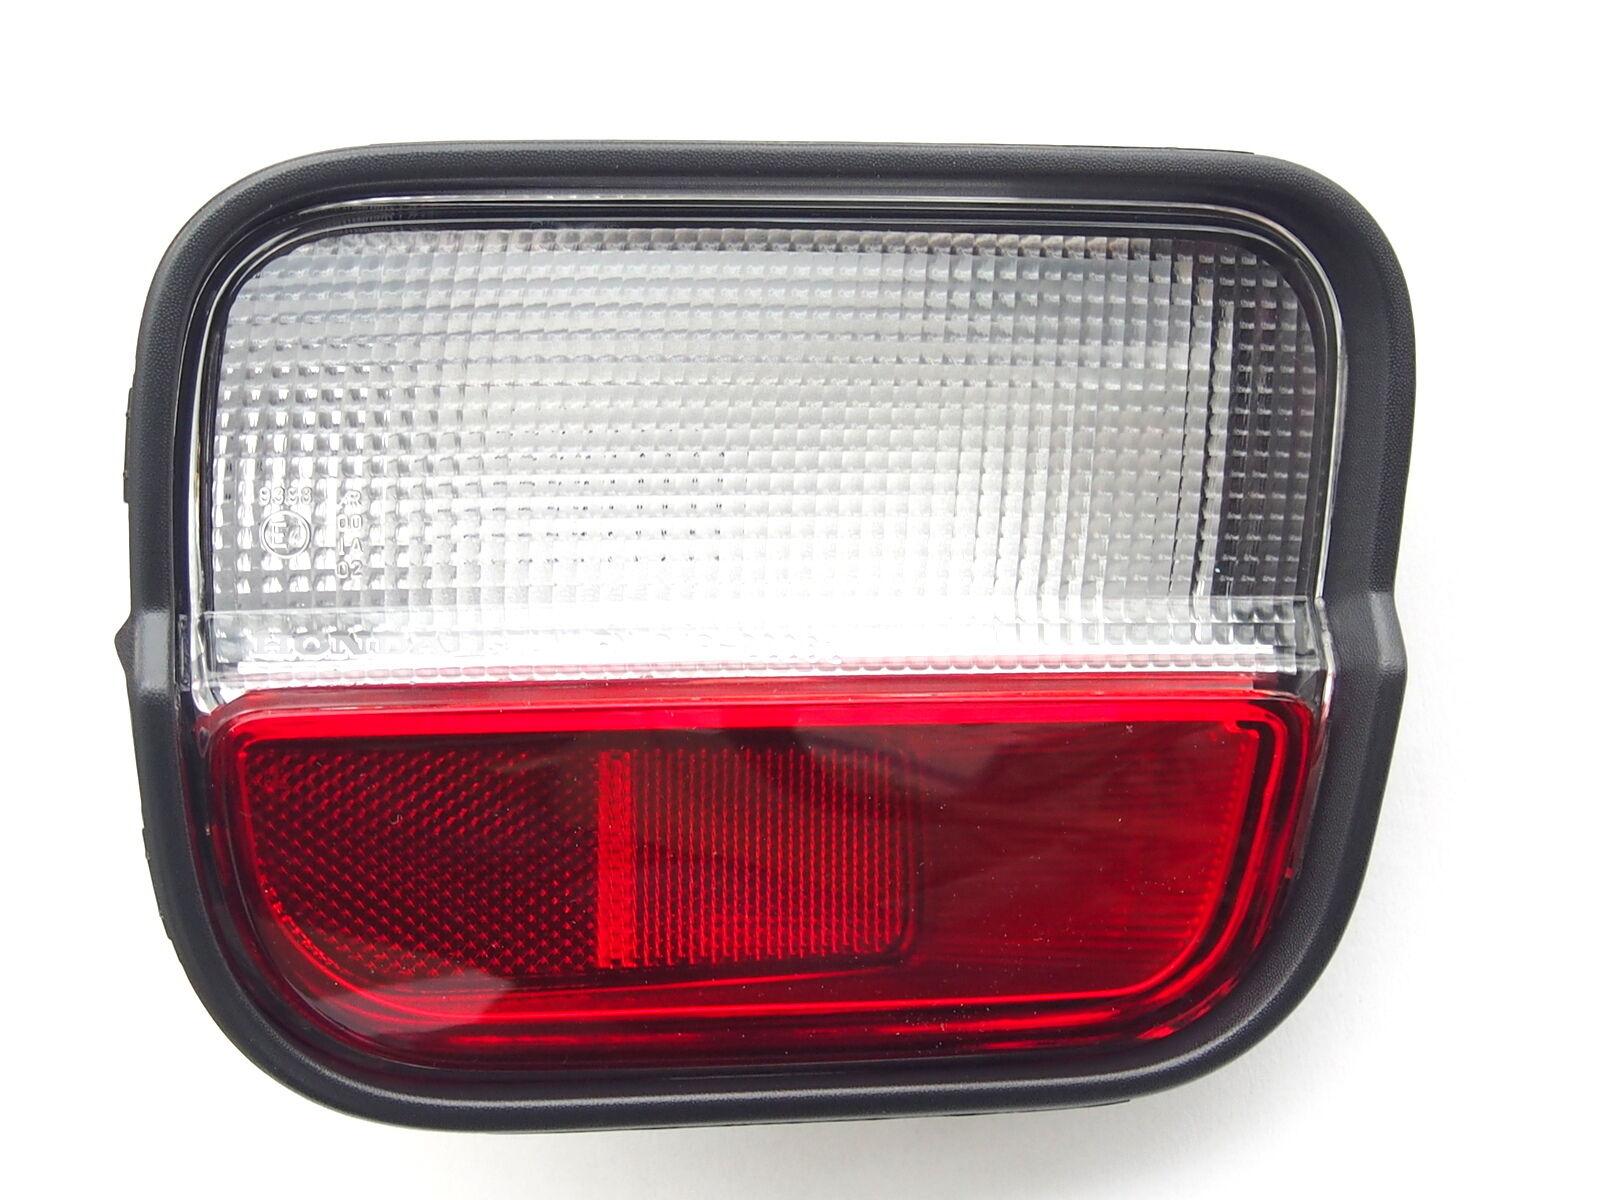 Honda CR-V MK I 1995-2002 SUV REAR LEFT LOWER REVERSE LAMP UNIT Genuine OE RHD